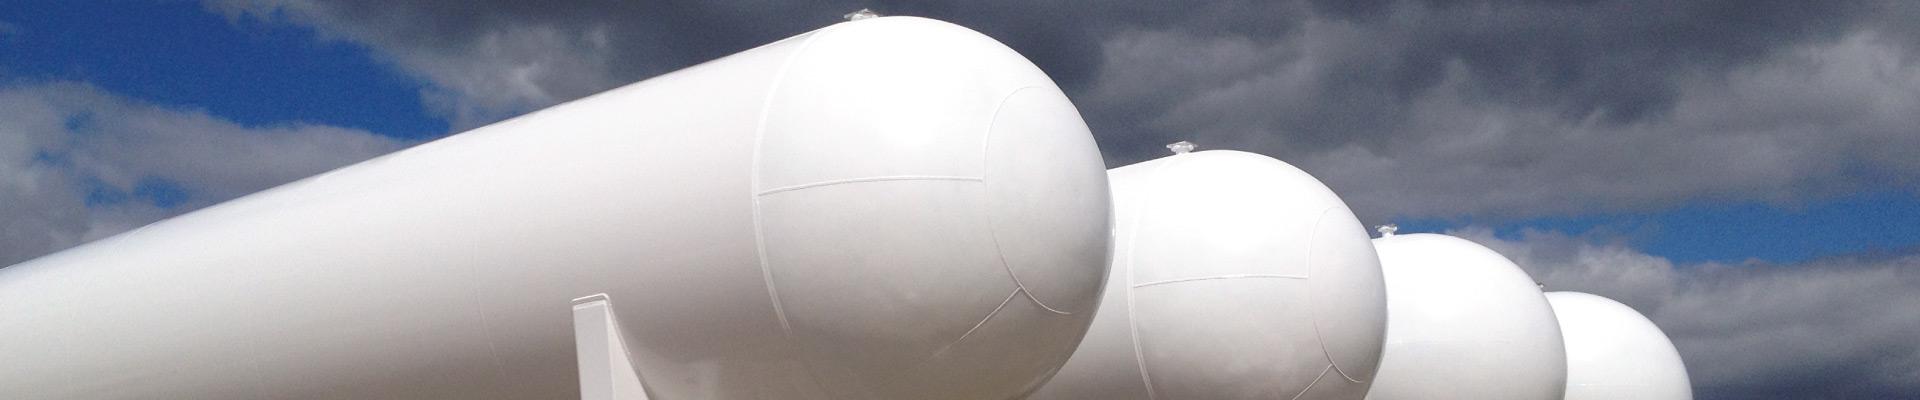 LPG, NH3, NGL Storage Tanks